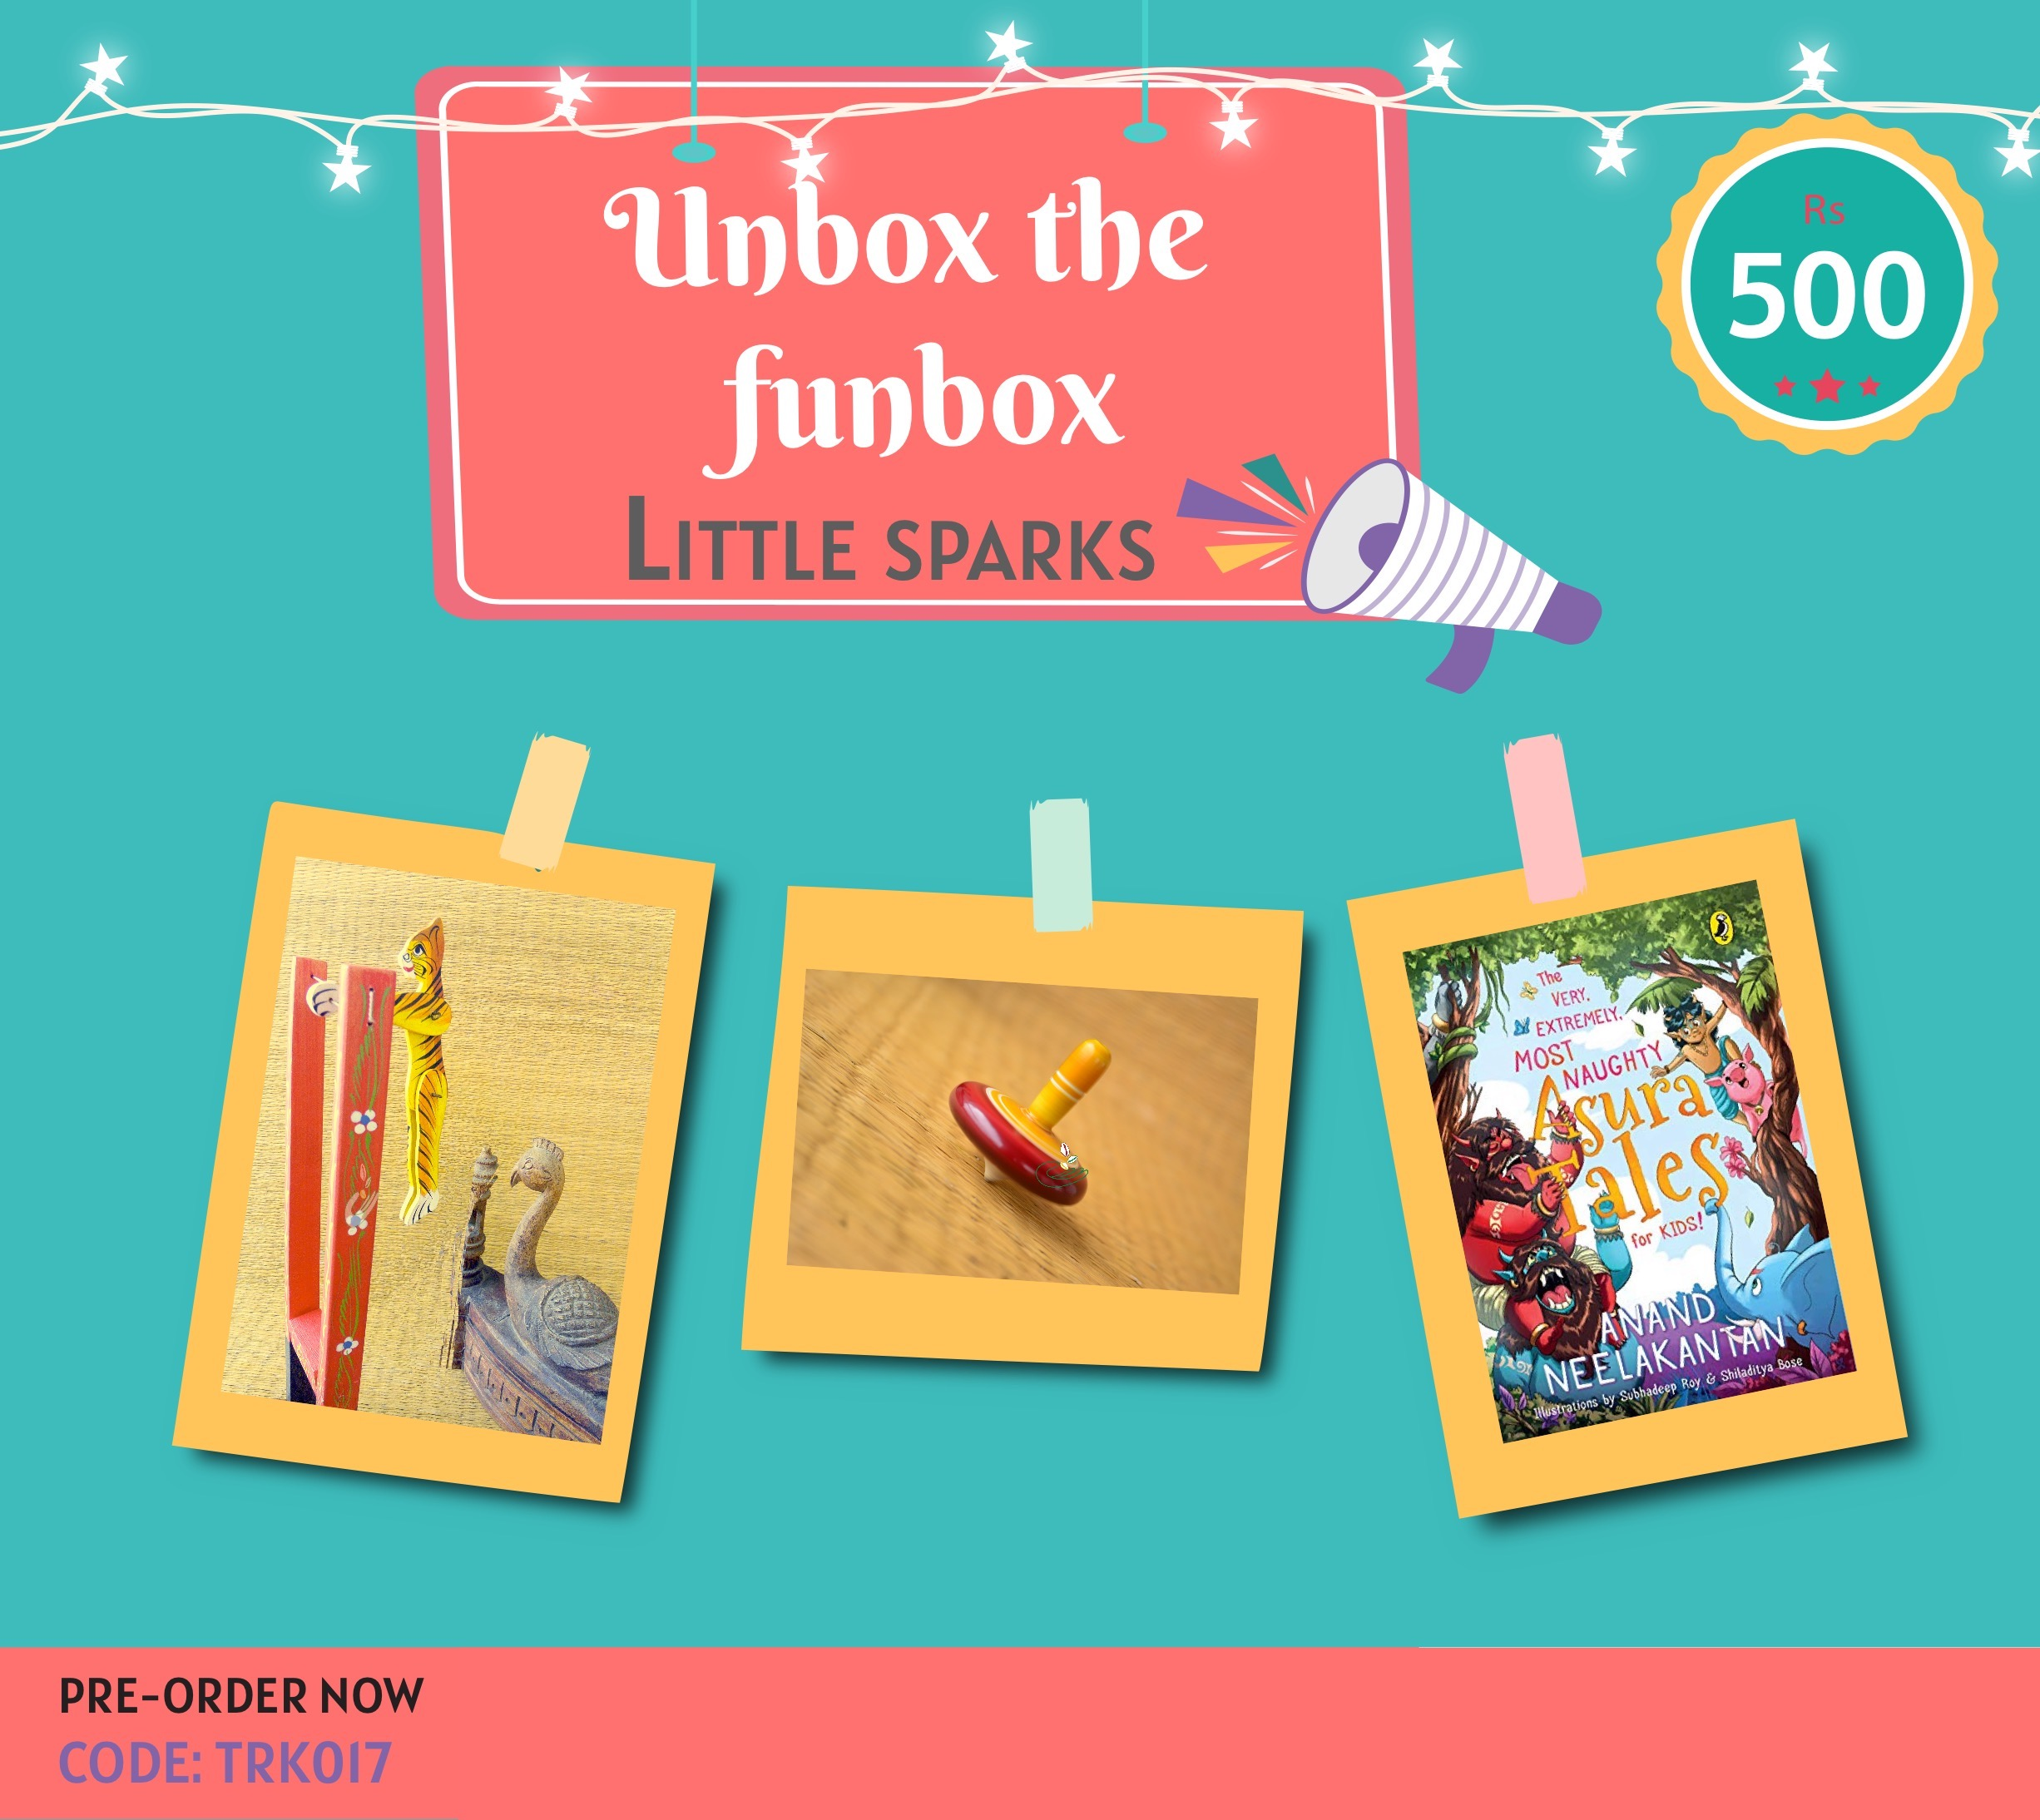 Giftbox Little Sparks [TRK 017]